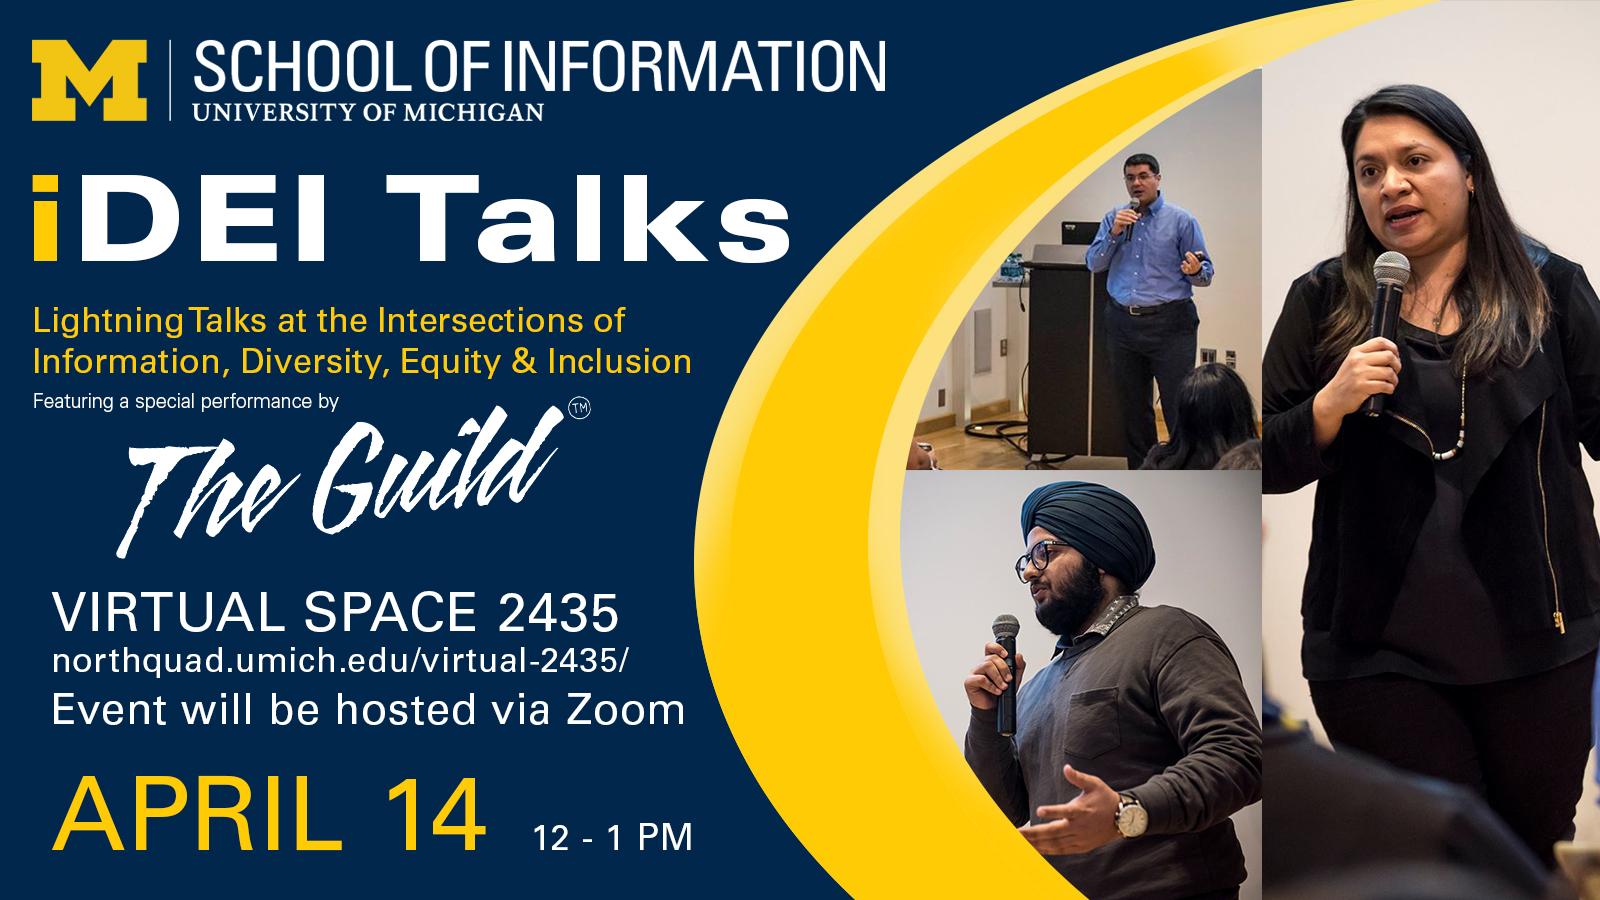 iDEI Talks at Virtual Space 2435